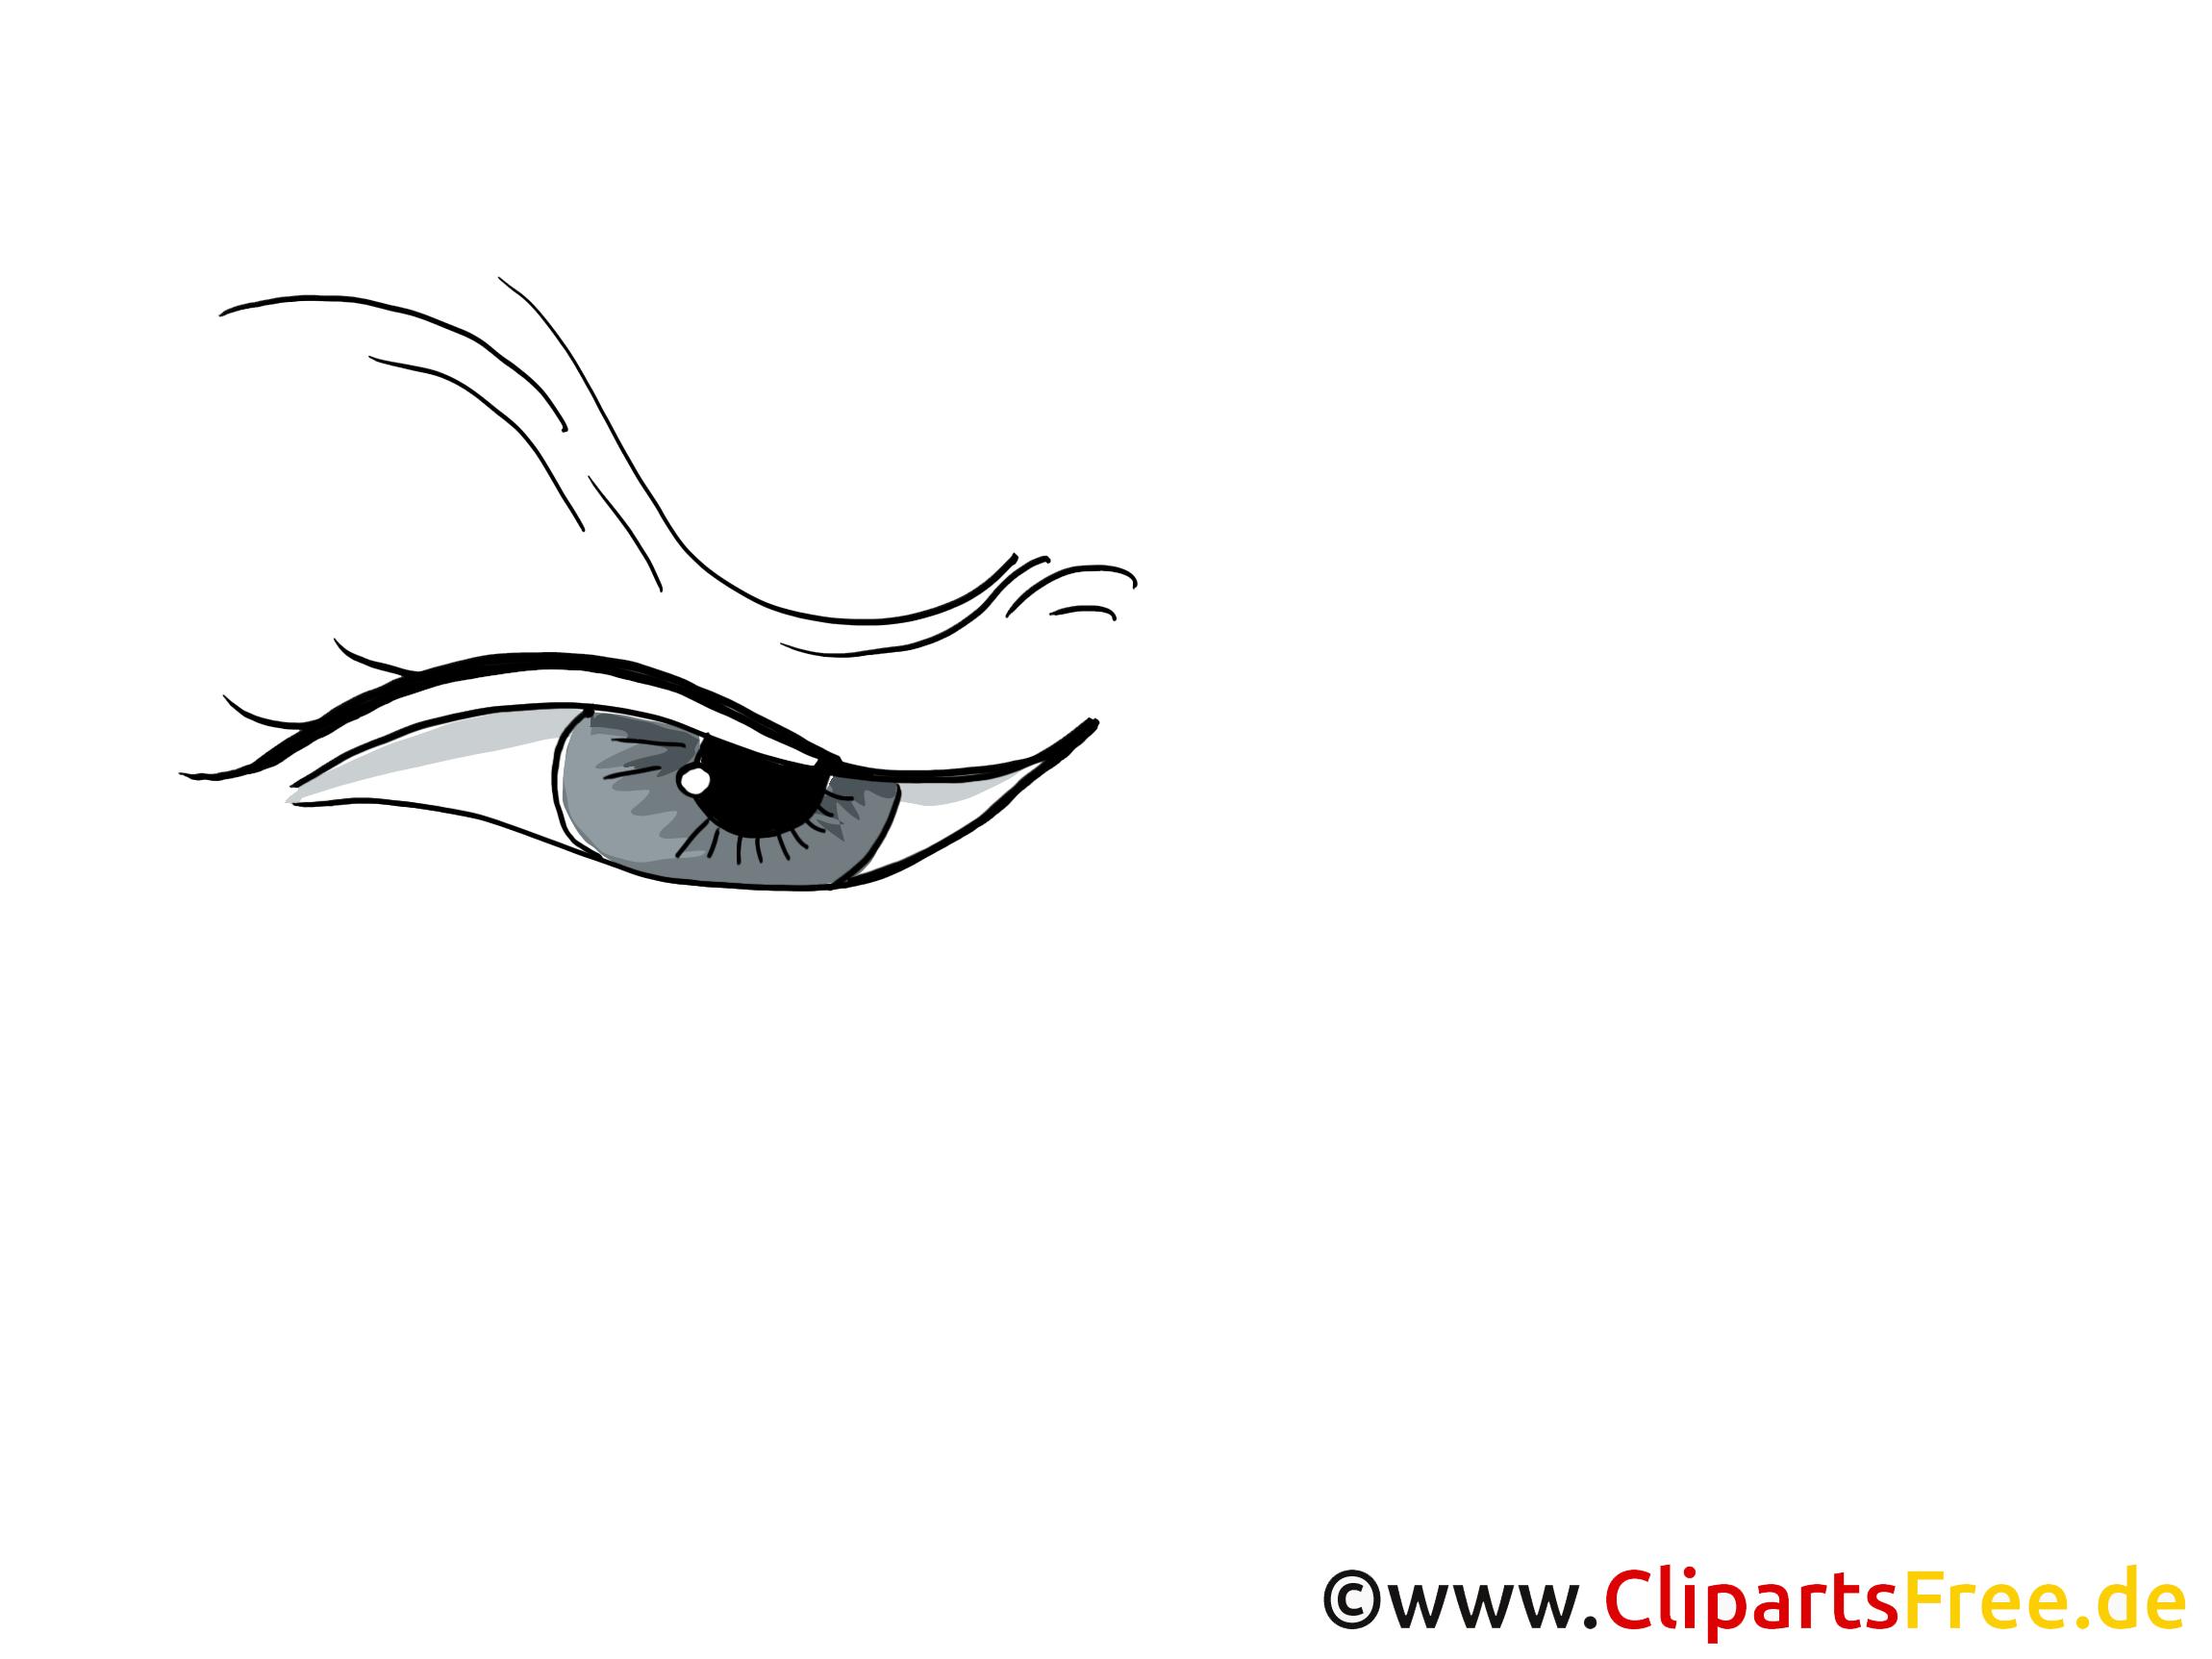 Oeil image gratuite – Dessin clipart